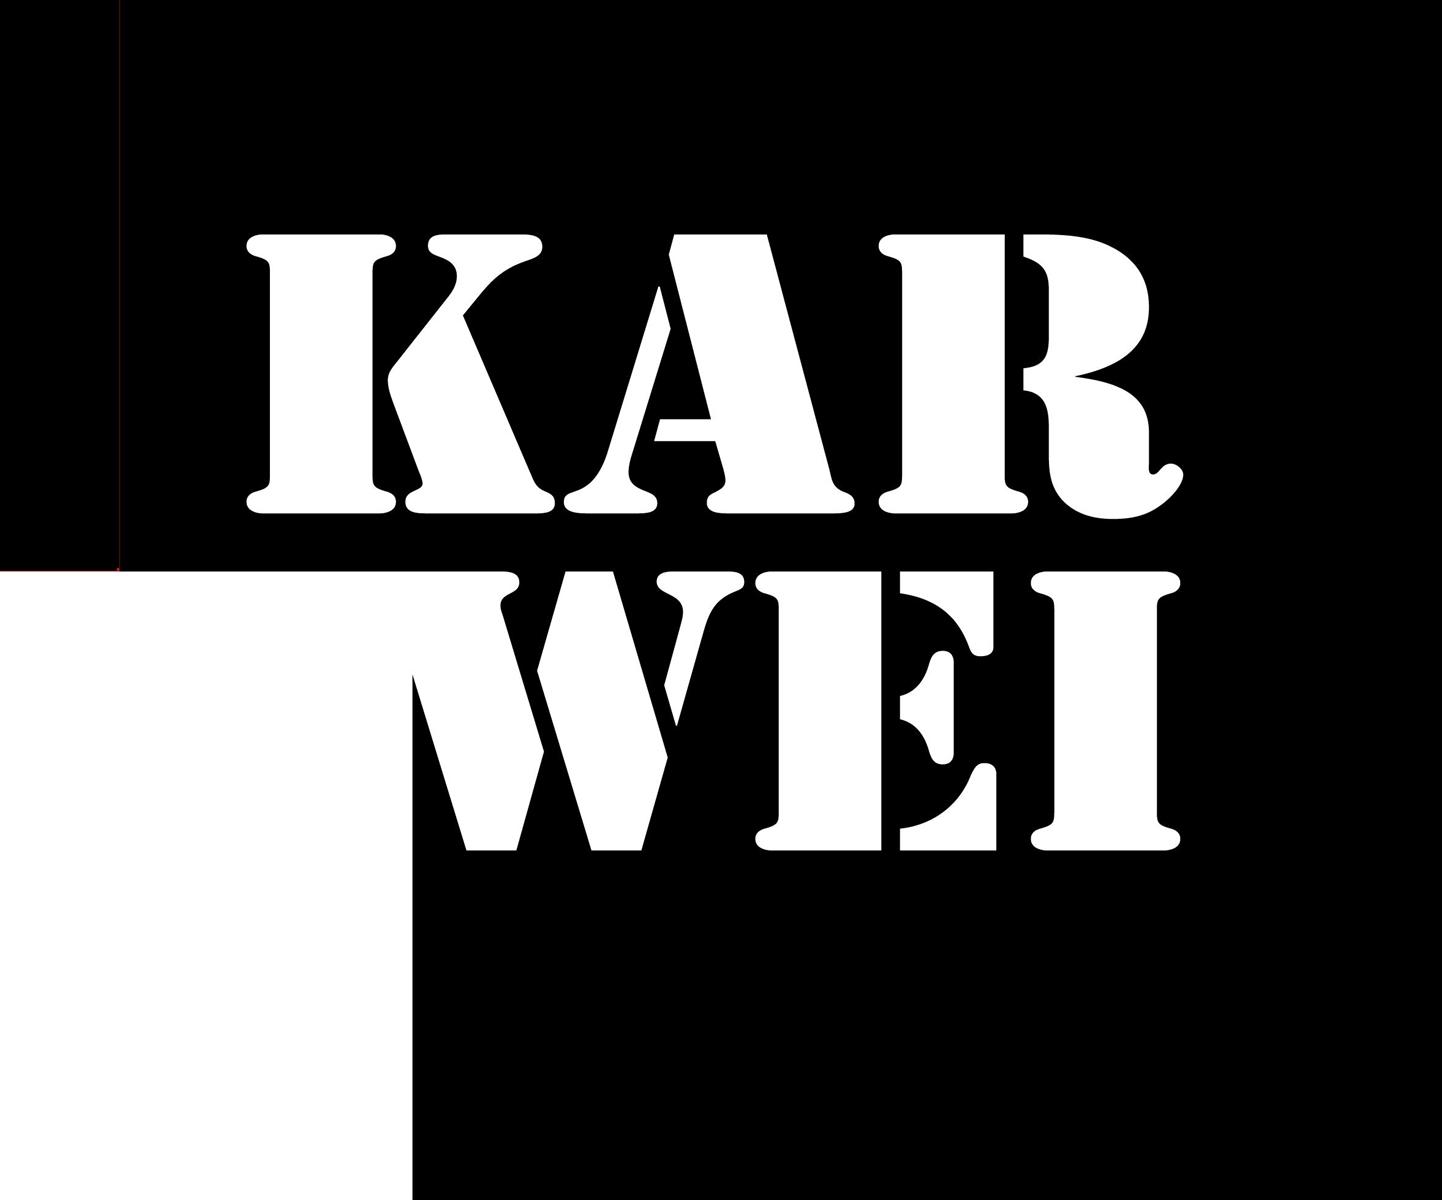 Losse Keukenkastjes Karwei.Karwei Bouwmarkt Keuken Vergelijk Bouwmarkt Keukens 2019